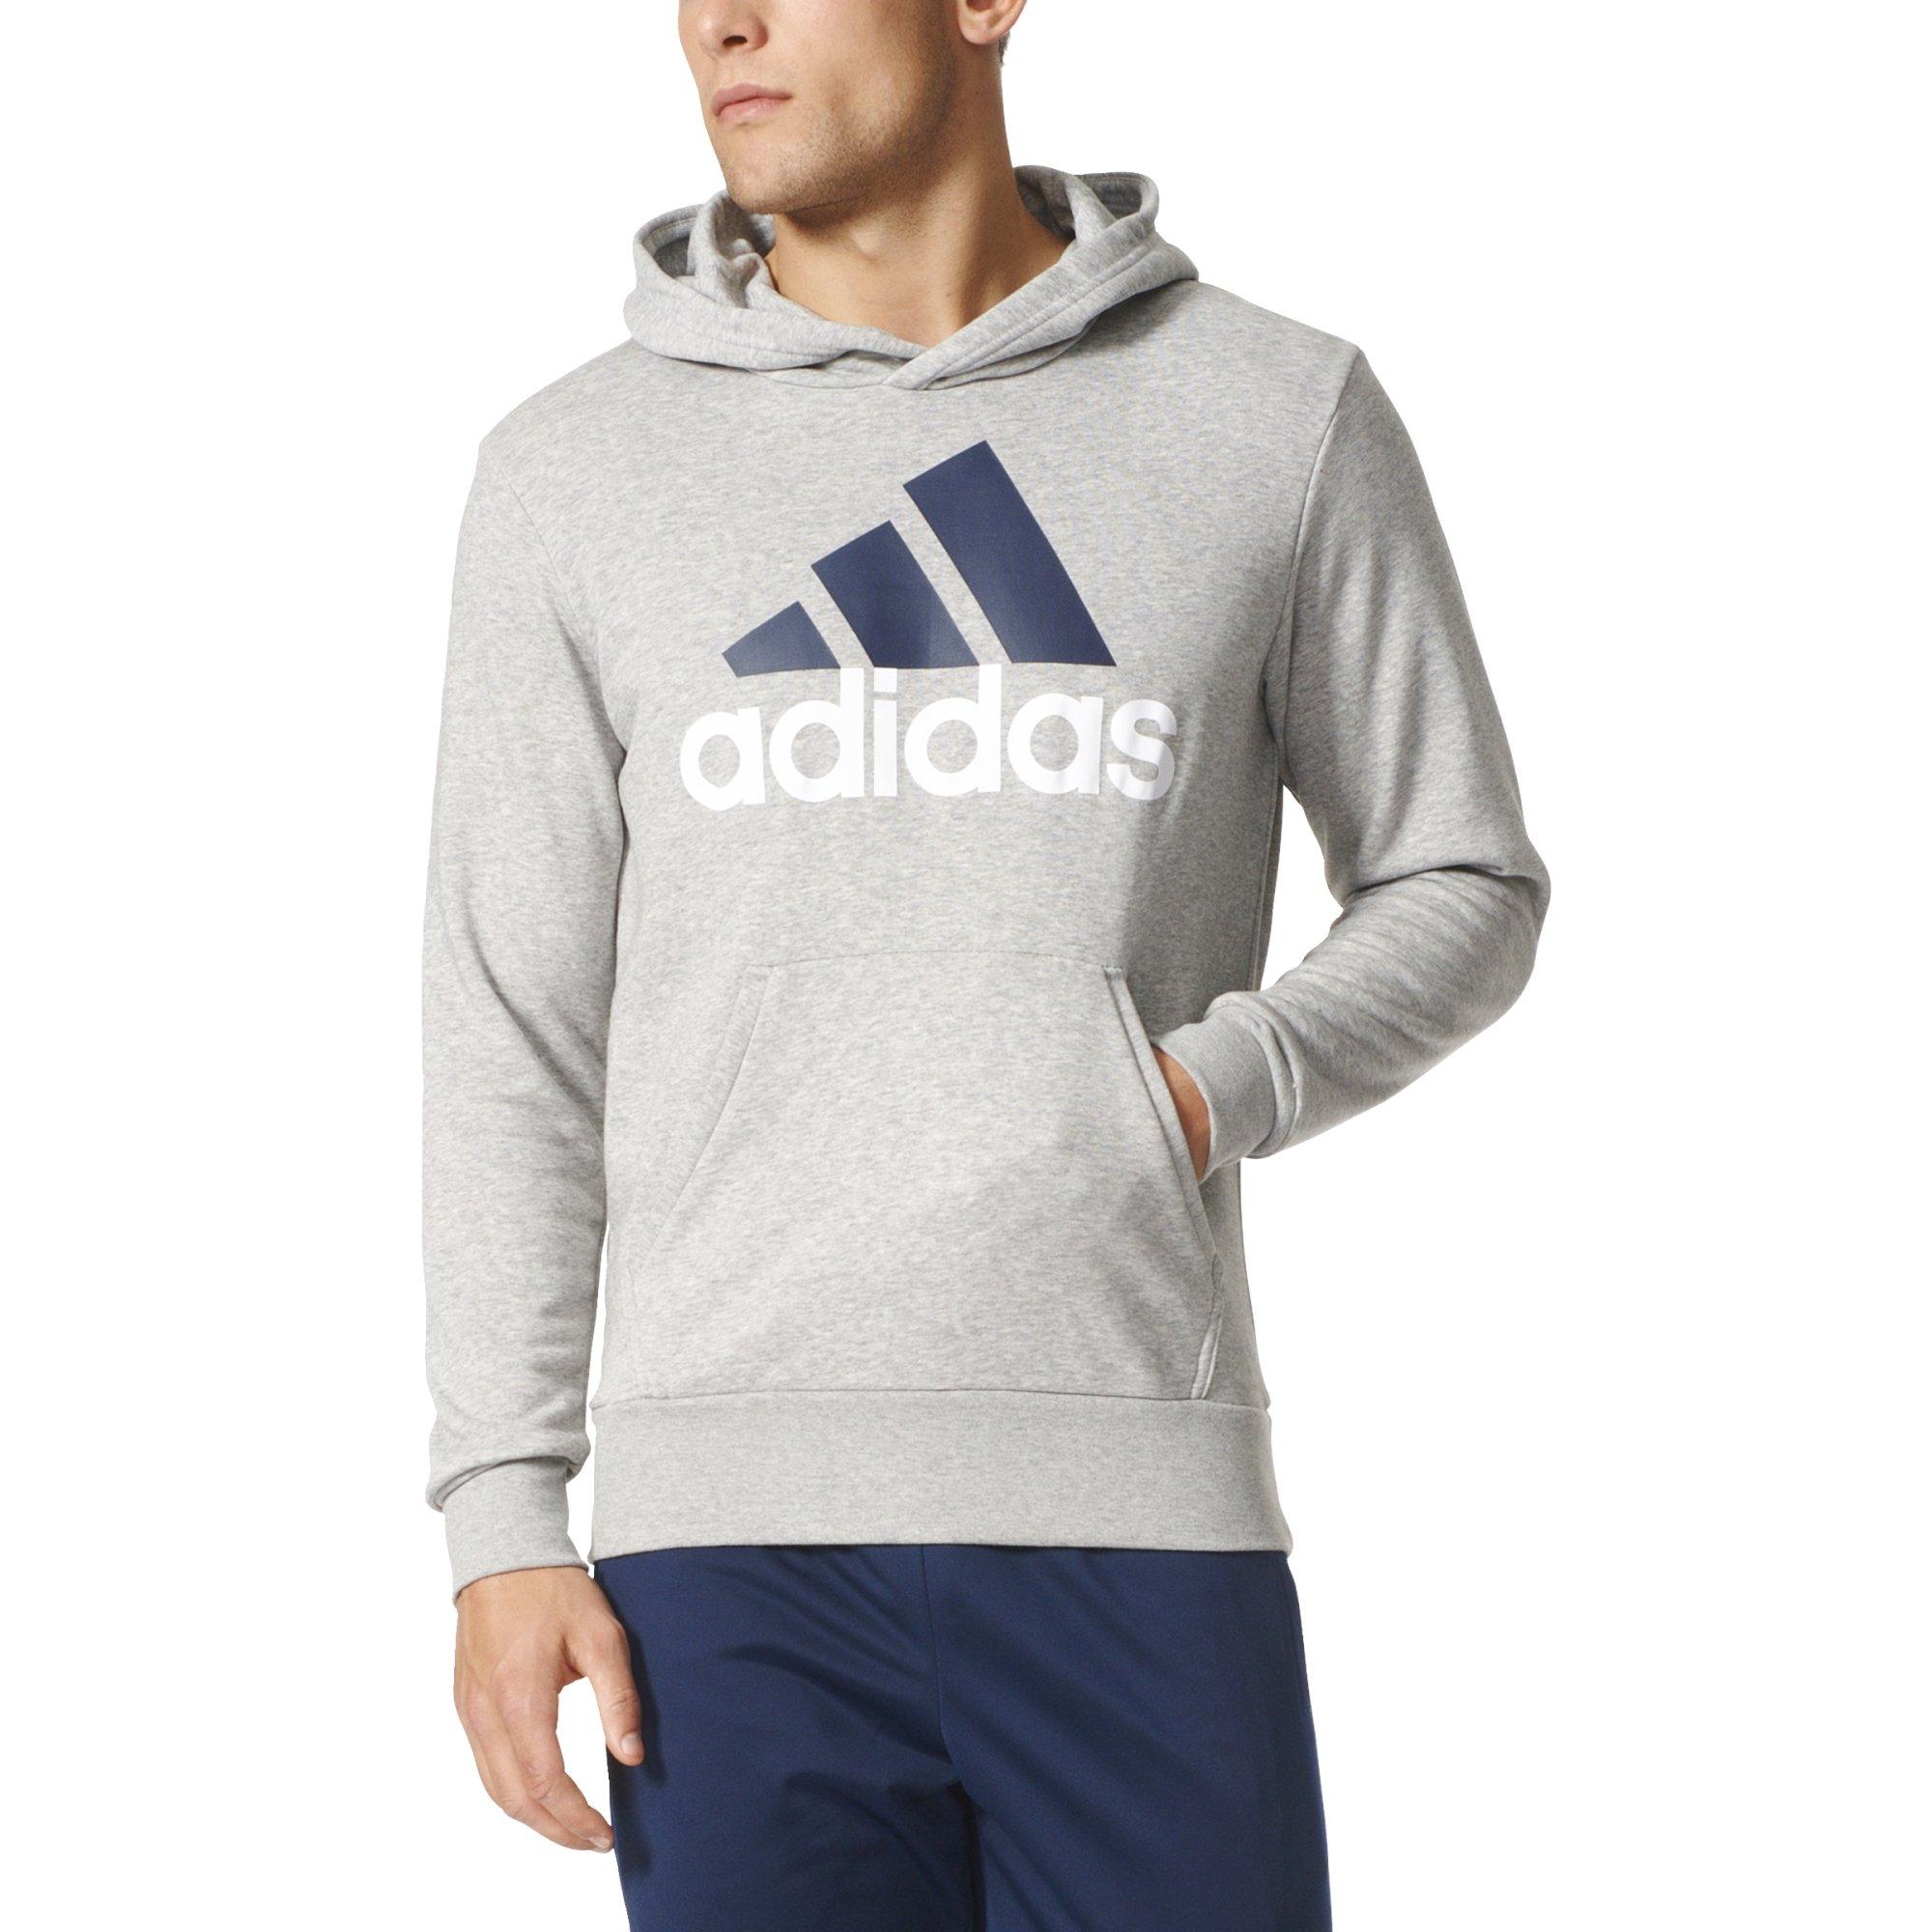 adidas Men's Essential Linear Logo Pullover Hoodie, Medium Grey Heather, X-Large by adidas